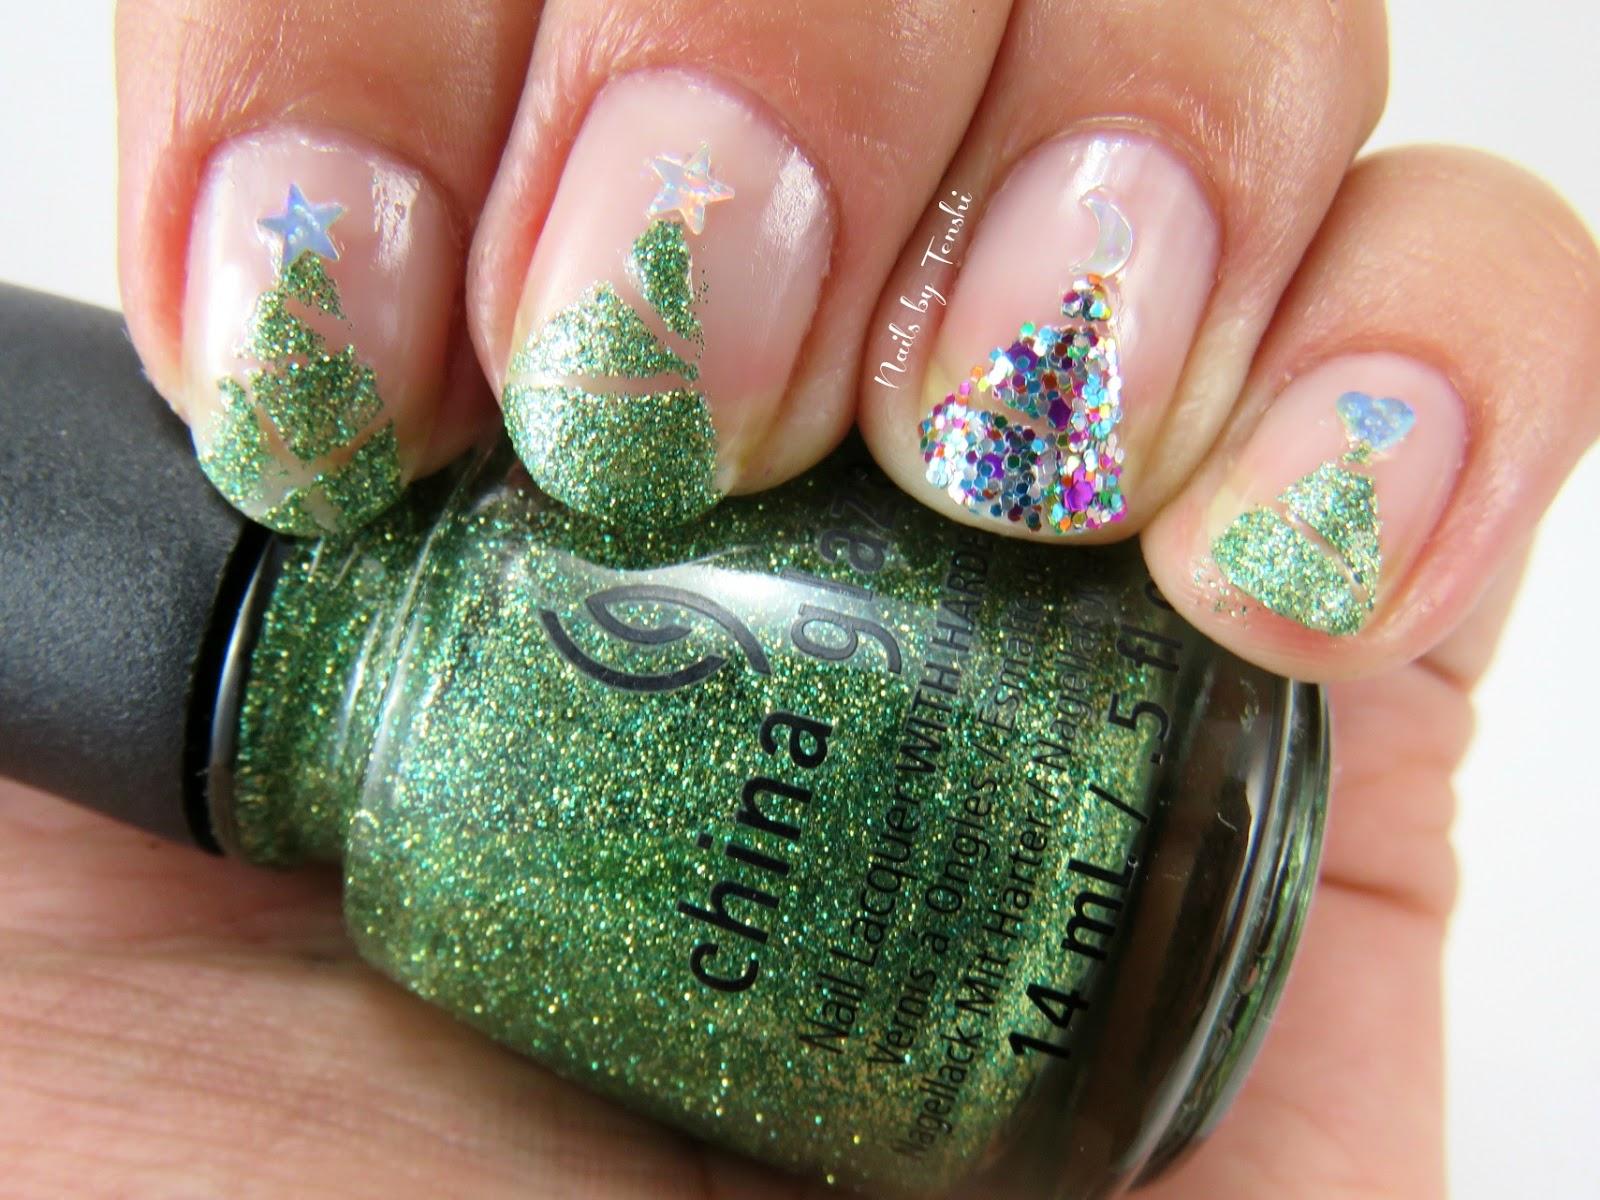 Nails by Tenshi: 2014